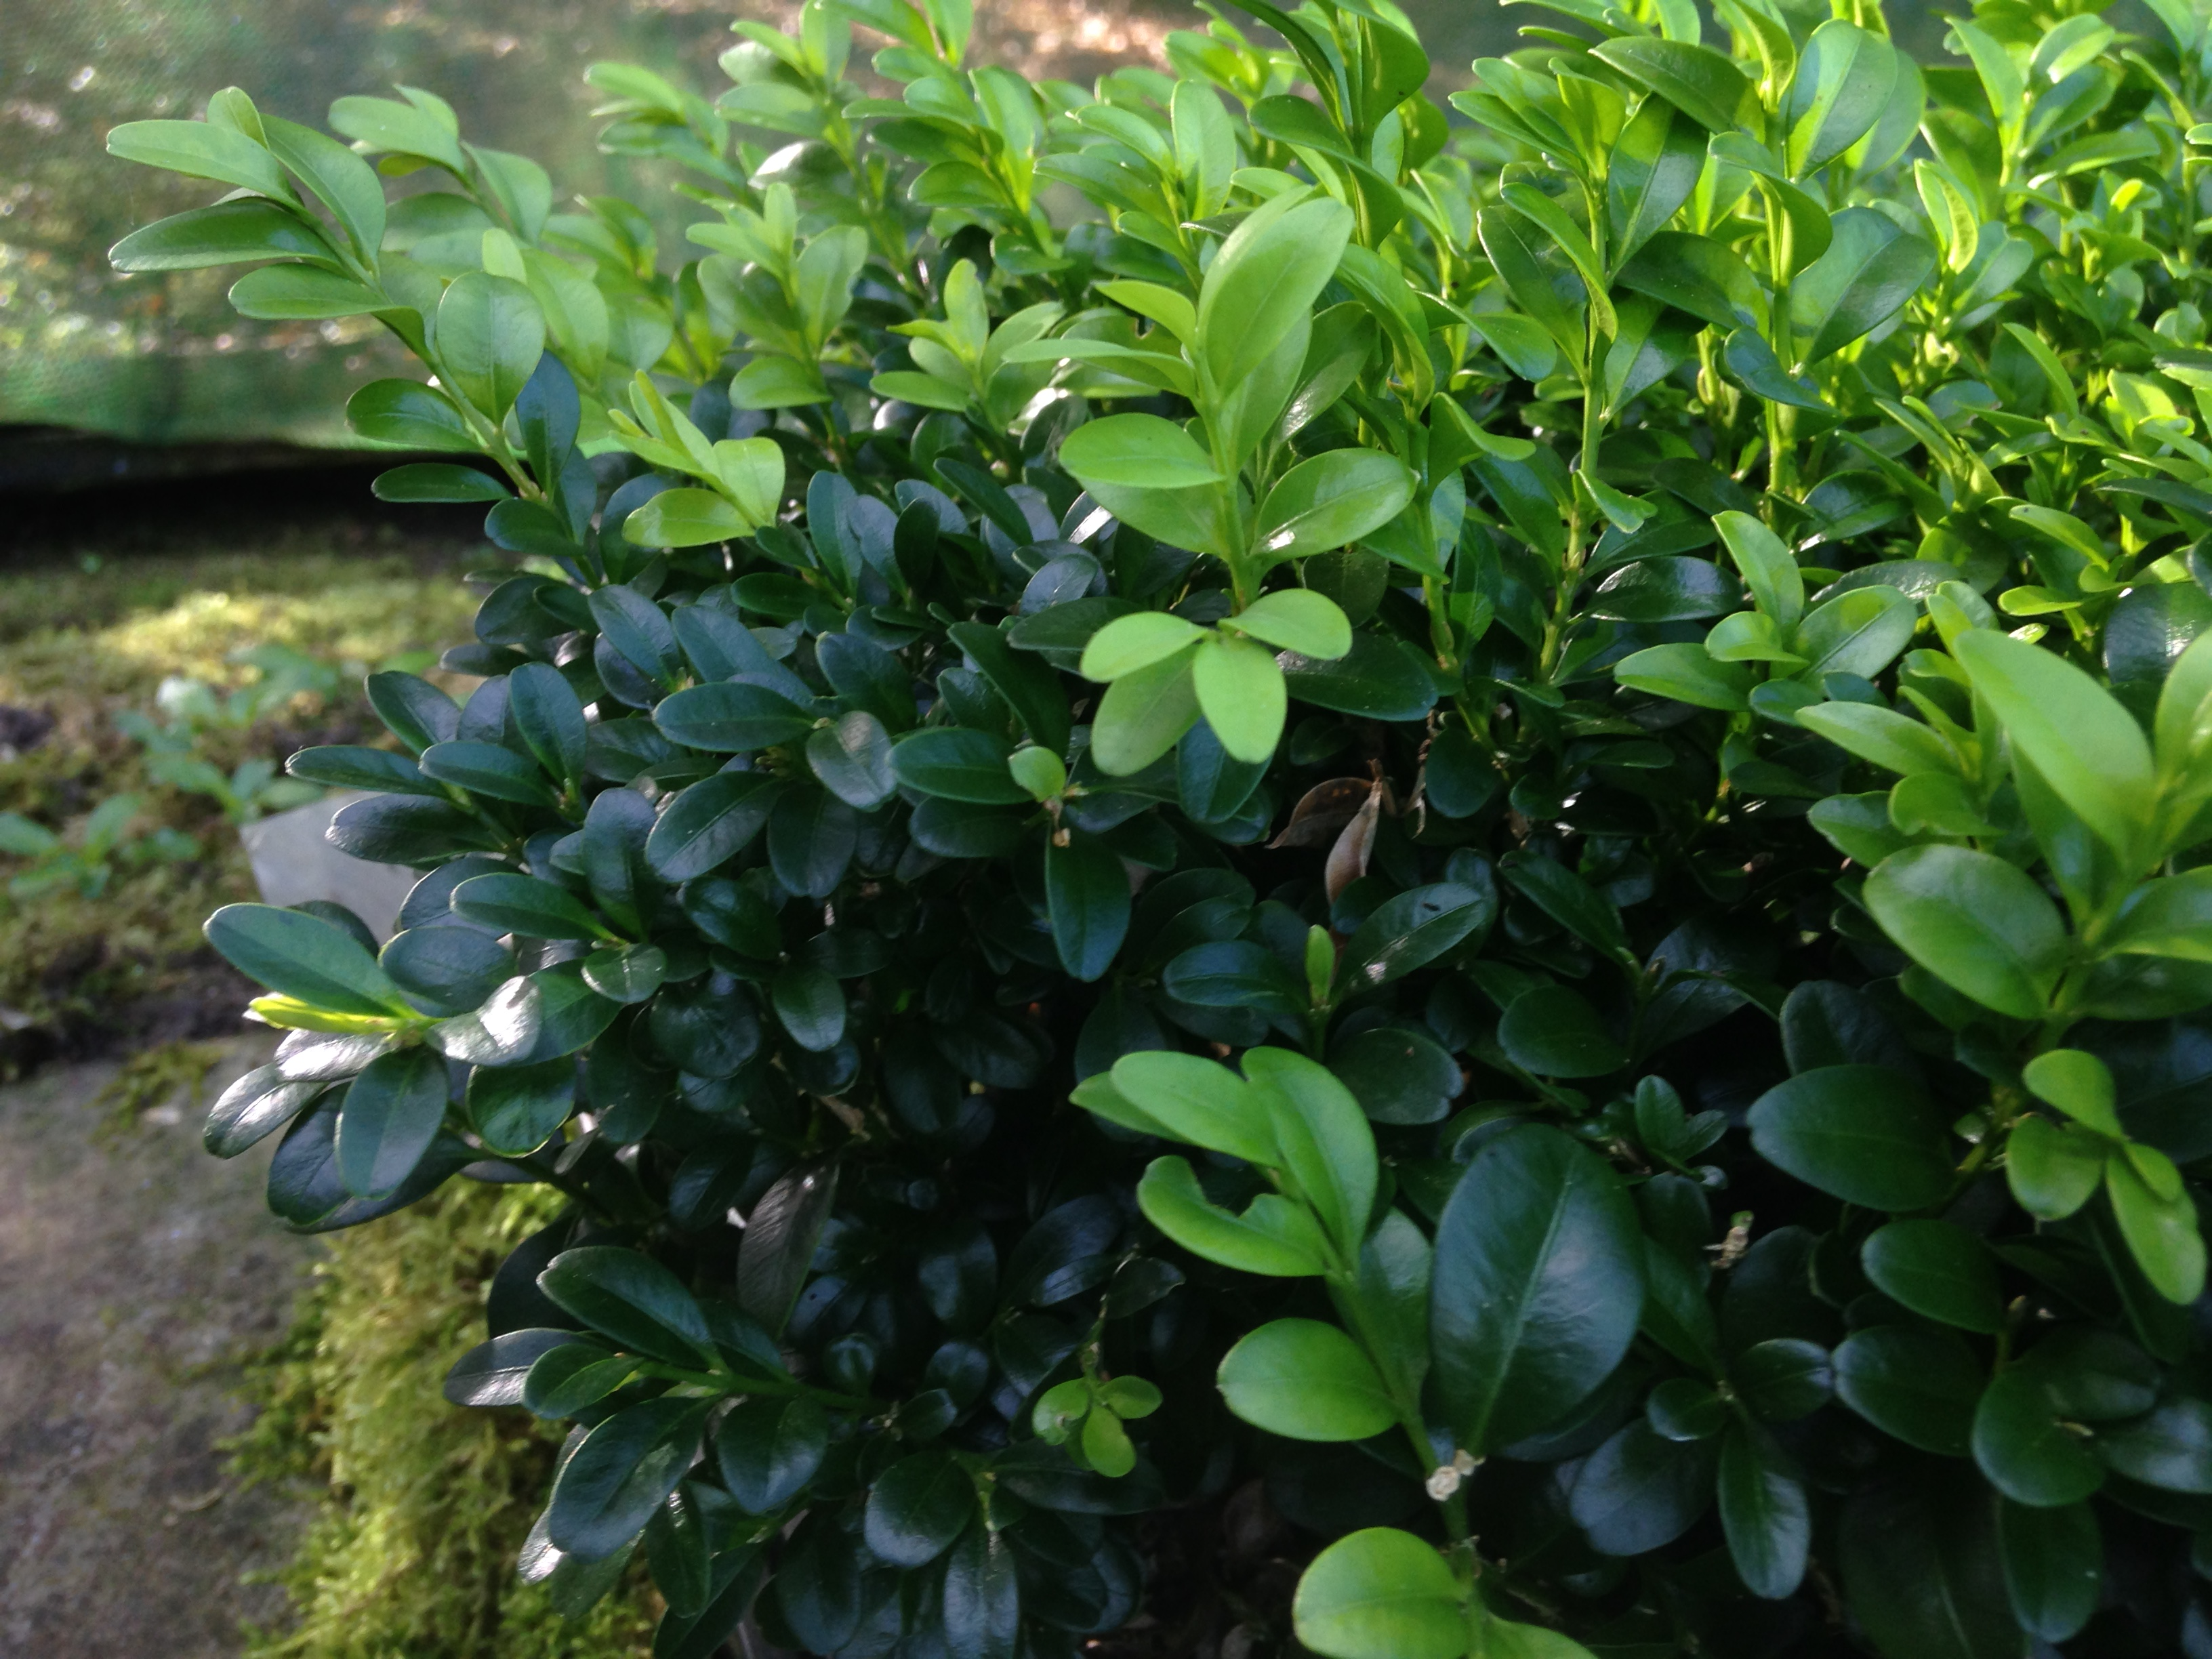 Dwarf Box plants for sale